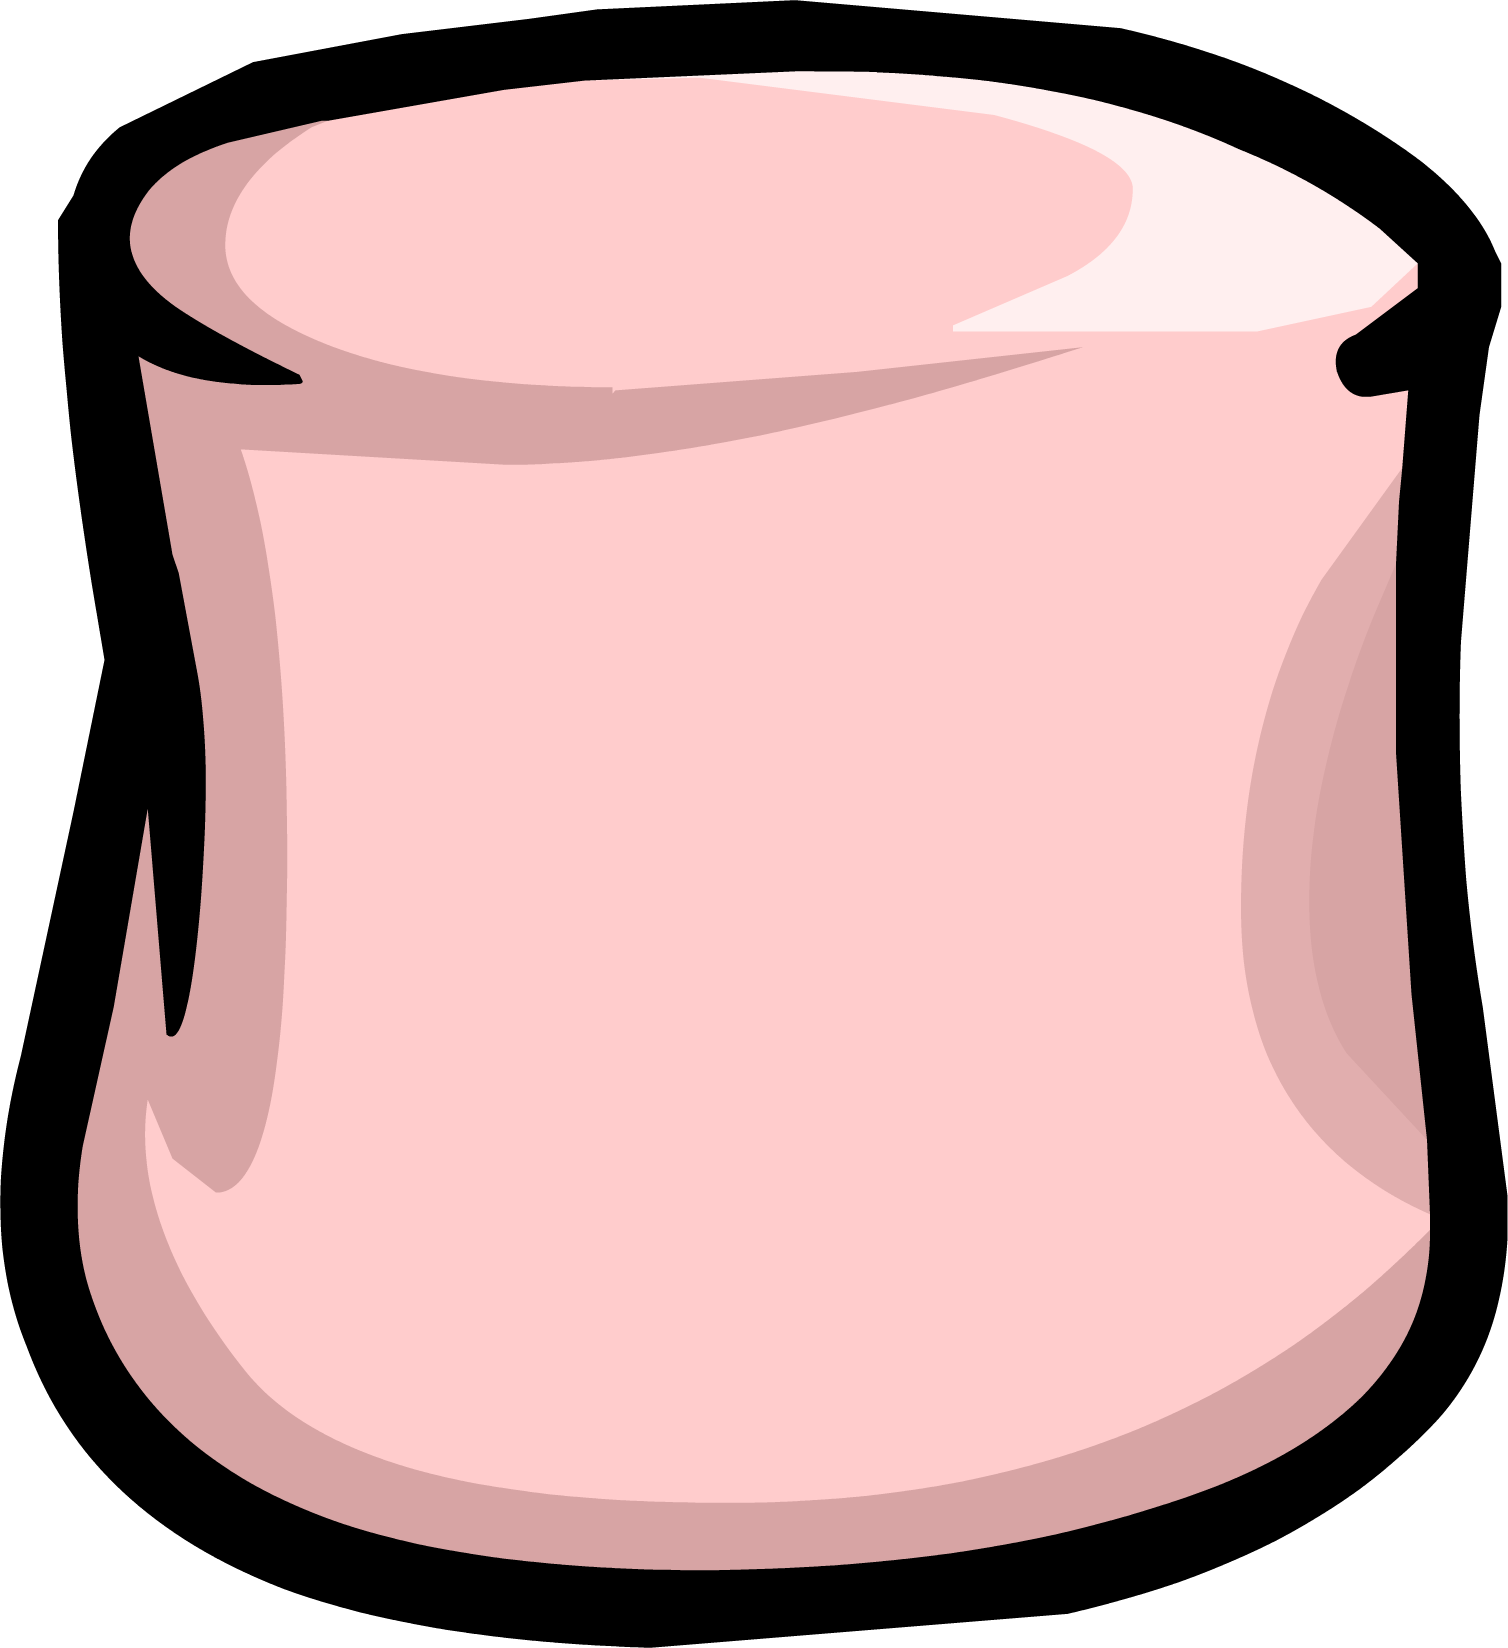 Marshmellow clipart Marshmallow 2 clipart clipart 4